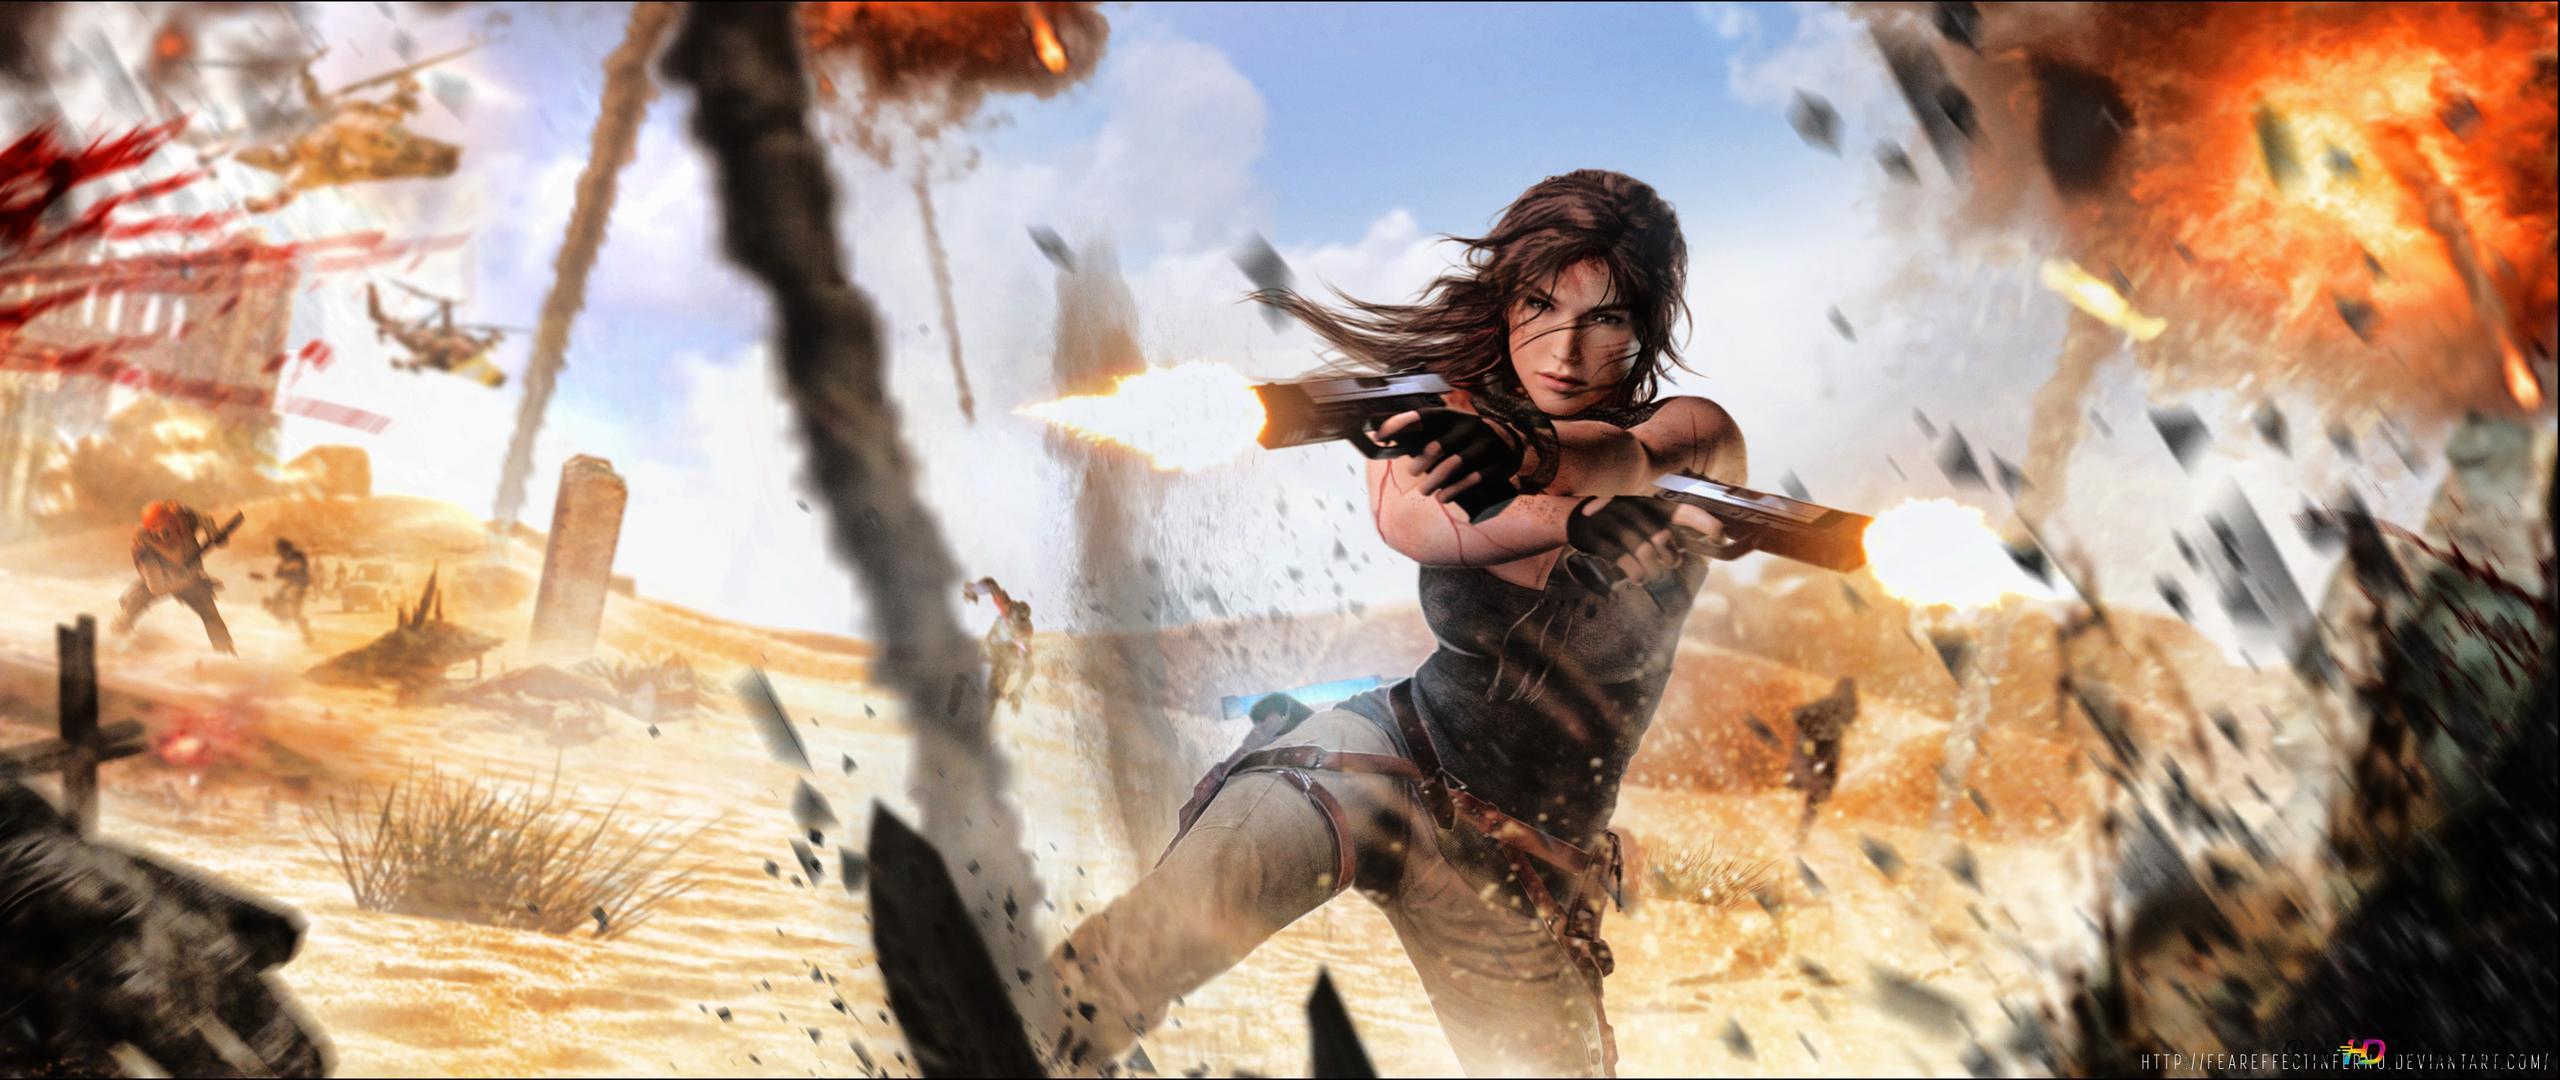 Shadow Of The Tomb Raider Zenith 2019 Lara Croft Archer Girl